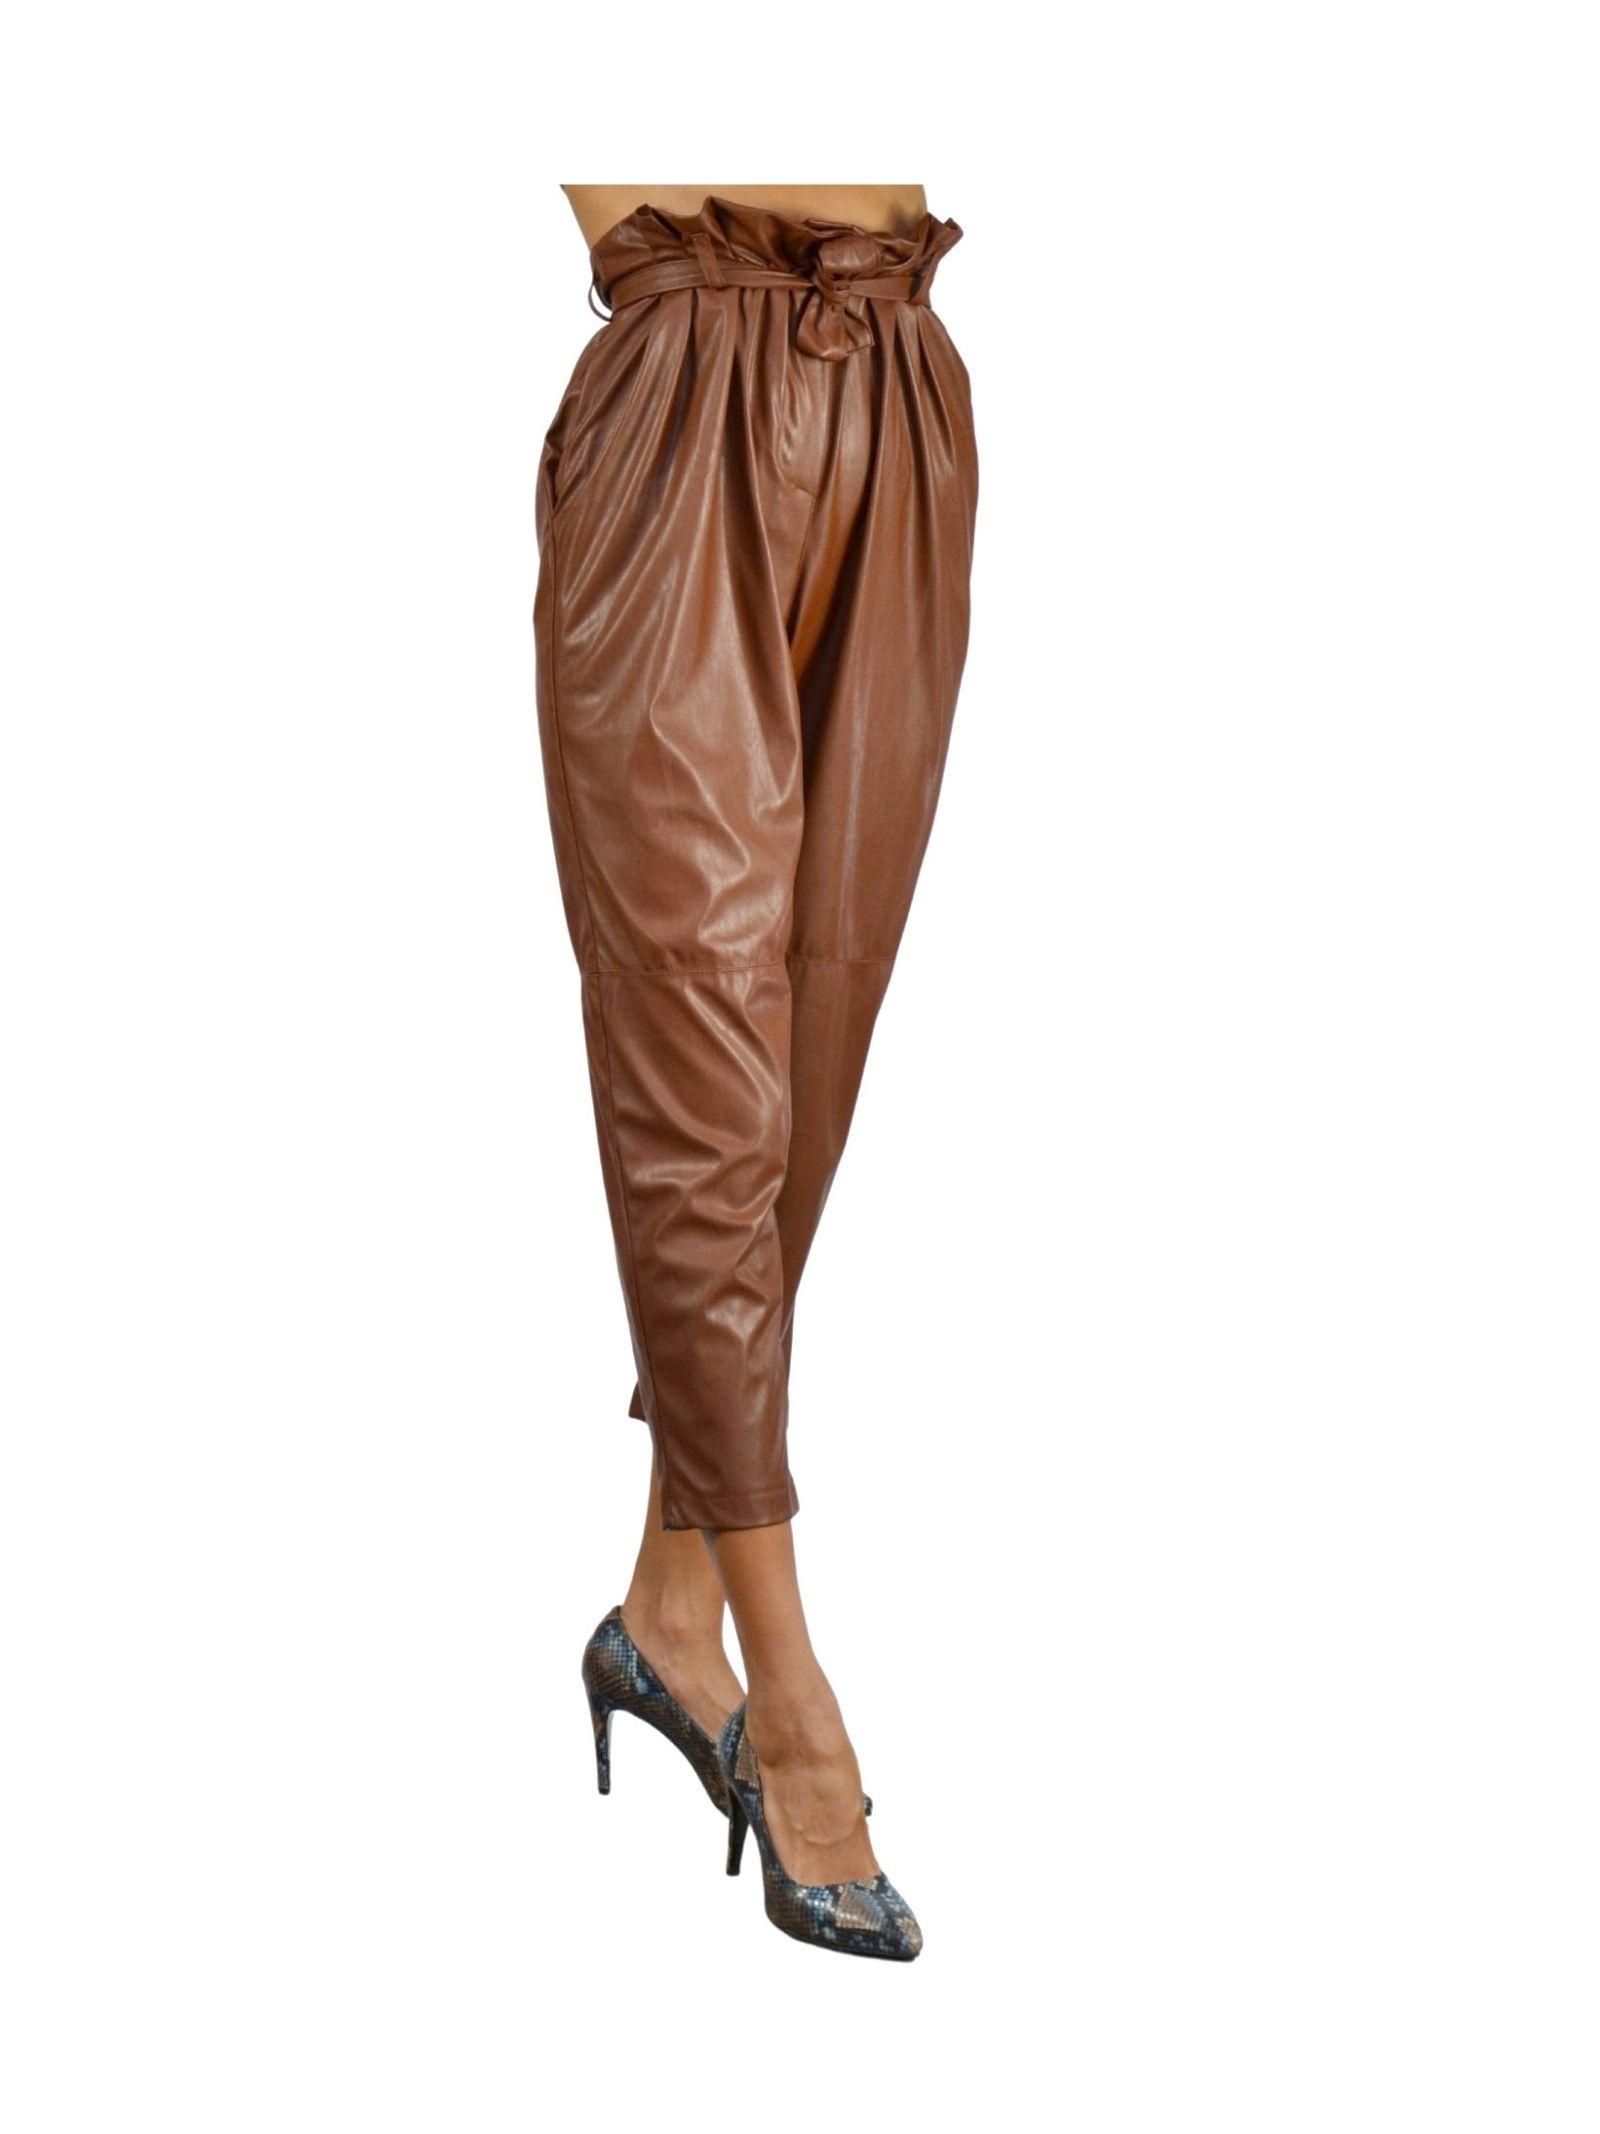 Pantalone Donna Ruggine Pink Memories | Gonne e Pantaloni | 1094318